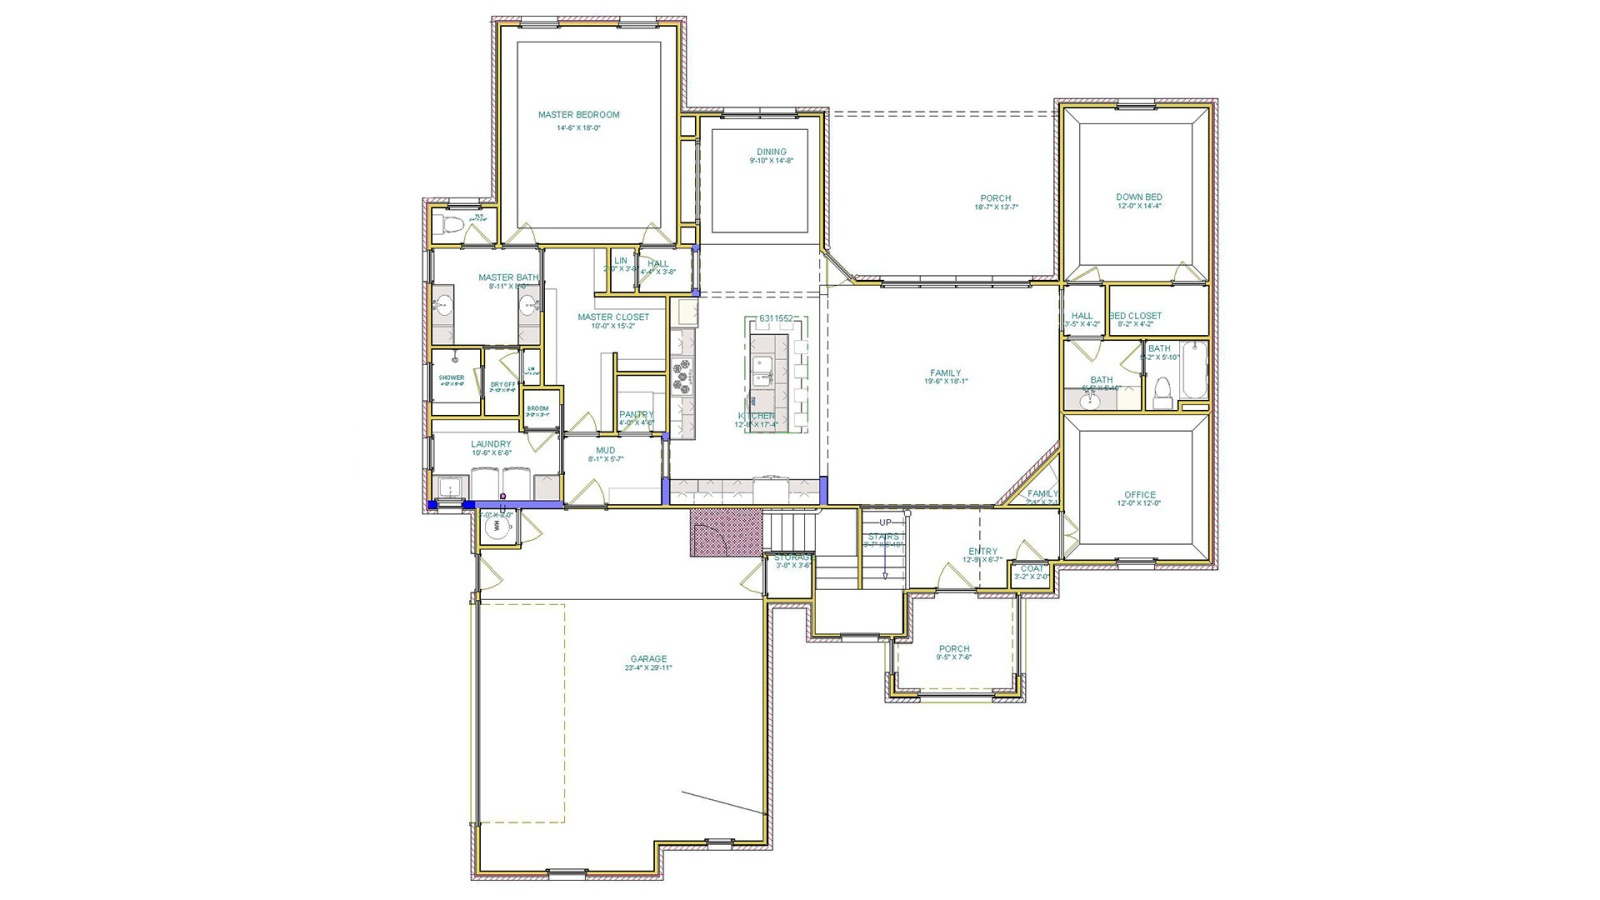 3 Bedrooms Bedrooms, ,3 BathroomsBathrooms,Custom Home,Home Plans,1049